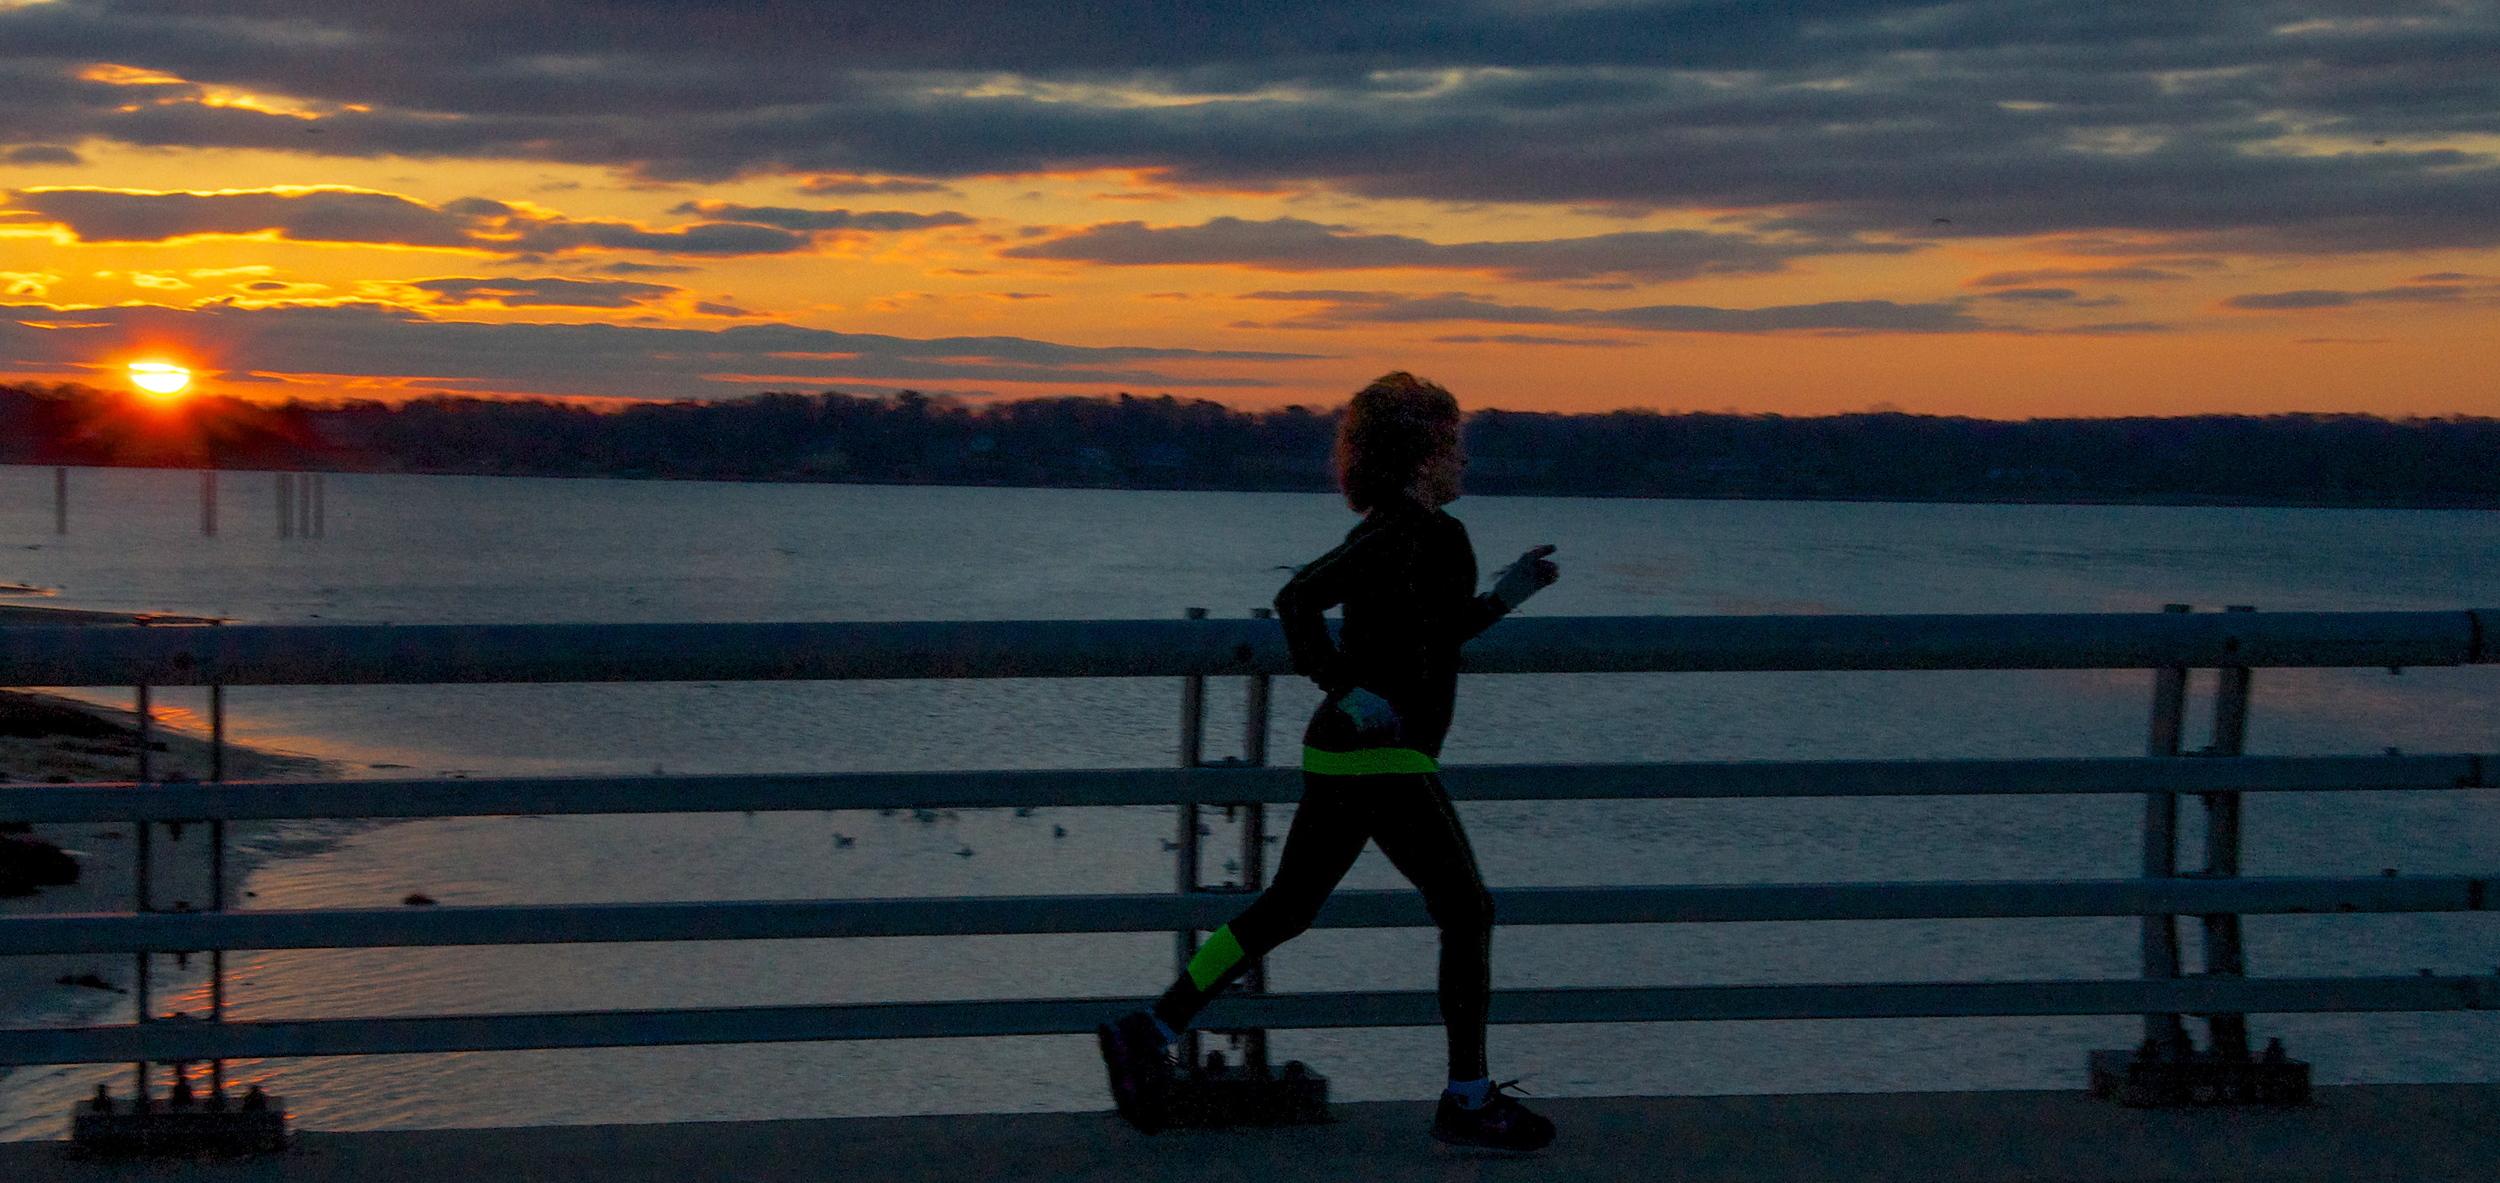 Jeri Cavagnaro often treks across the Bayville Bridge when she runs solo a few days each week. (Photo: Joseph Kellard)